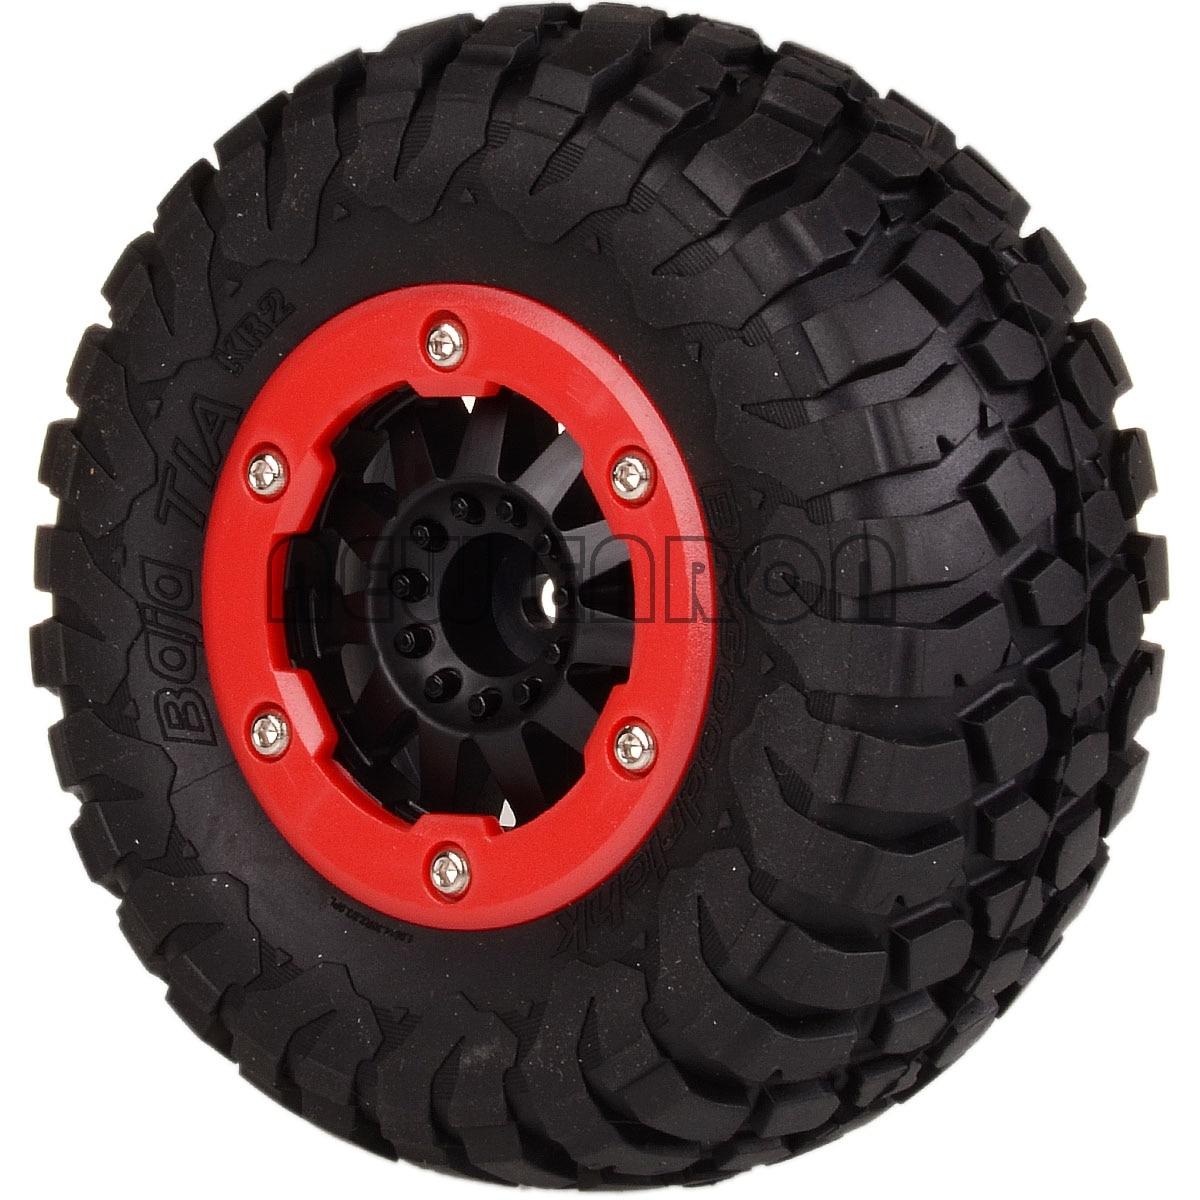 NEW ENRON 4PCS Short Course Truck <font><b>105</b></font>-108MM & Bead-Lock Rims Hub FOR TRAXXAS 10SC HPI